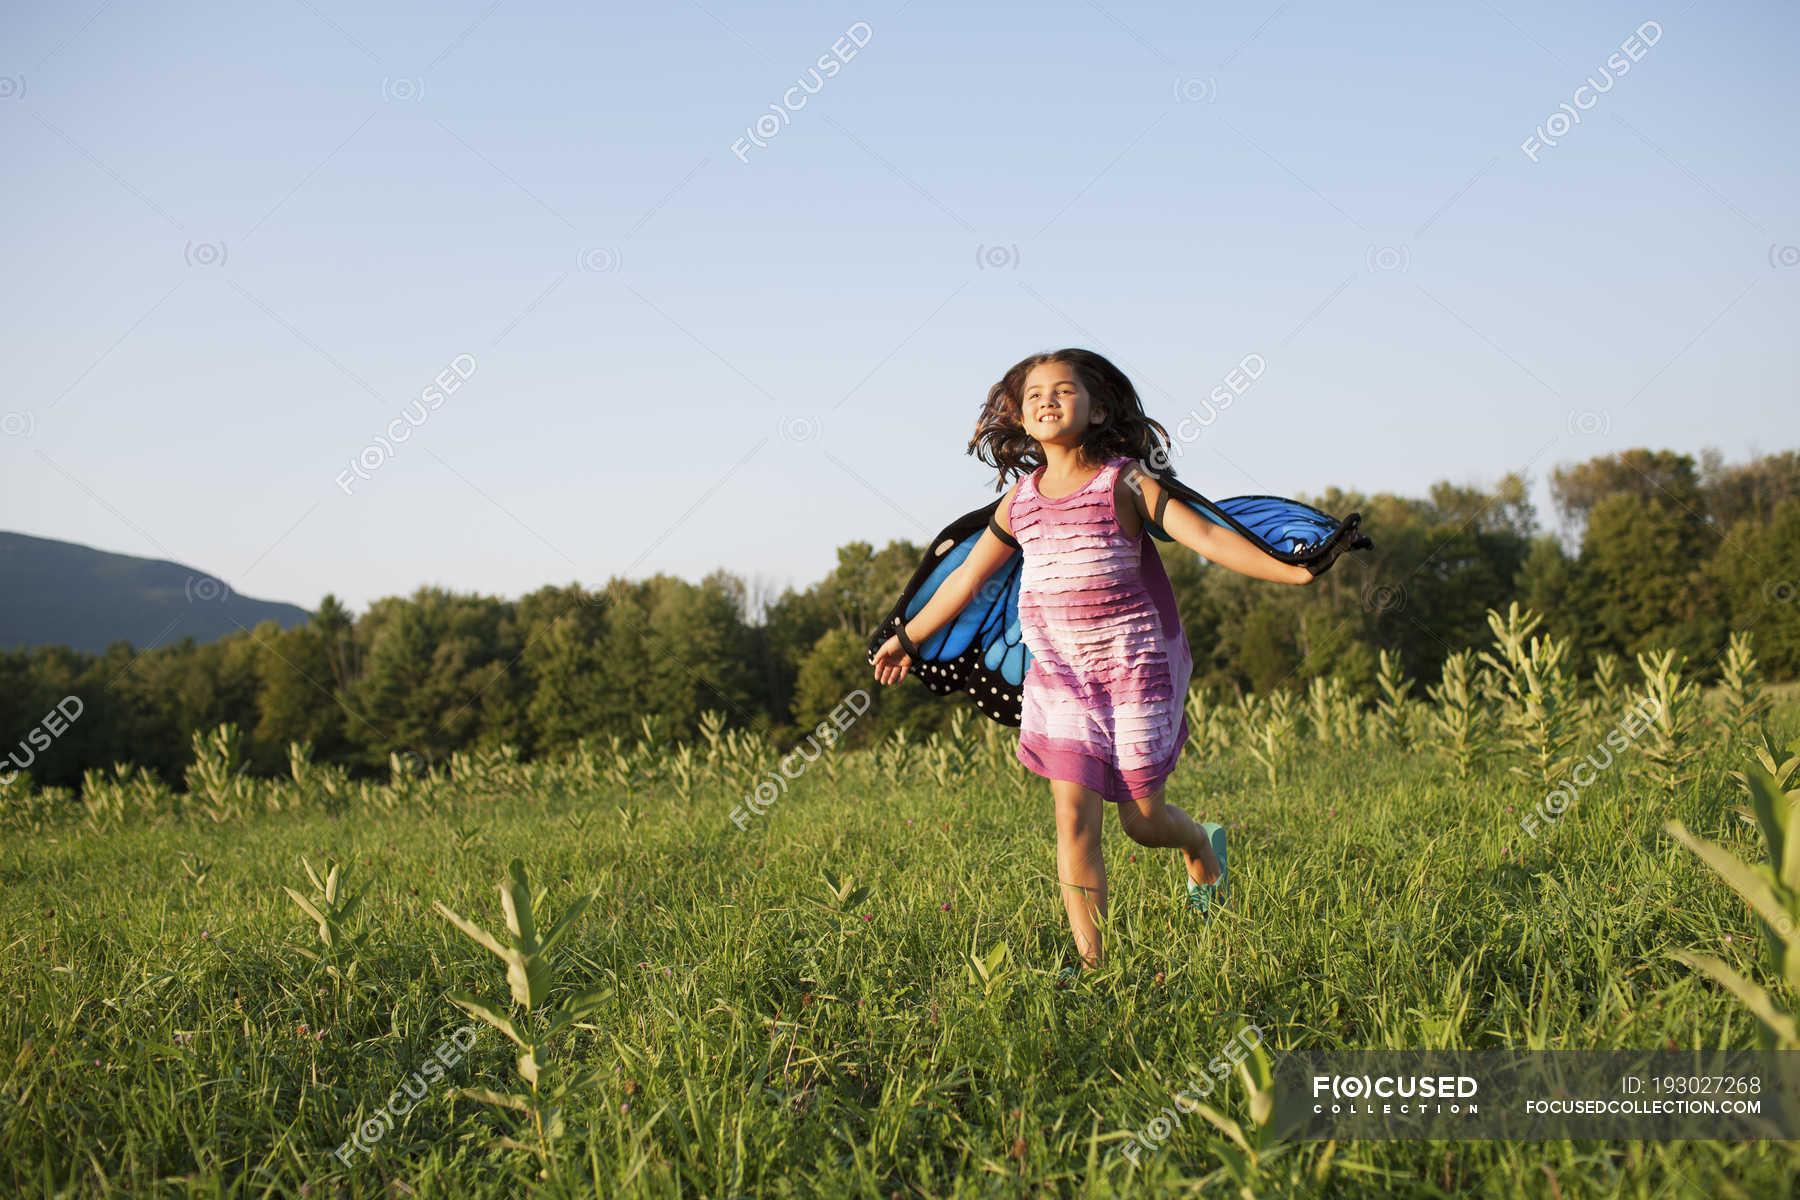 Menina Pre Adolescente Correndo Atraves Do Campo Usando Asas De Borboleta De Tecido Terras Cultivadas Bracos Estendidos Stock Photo 193027268